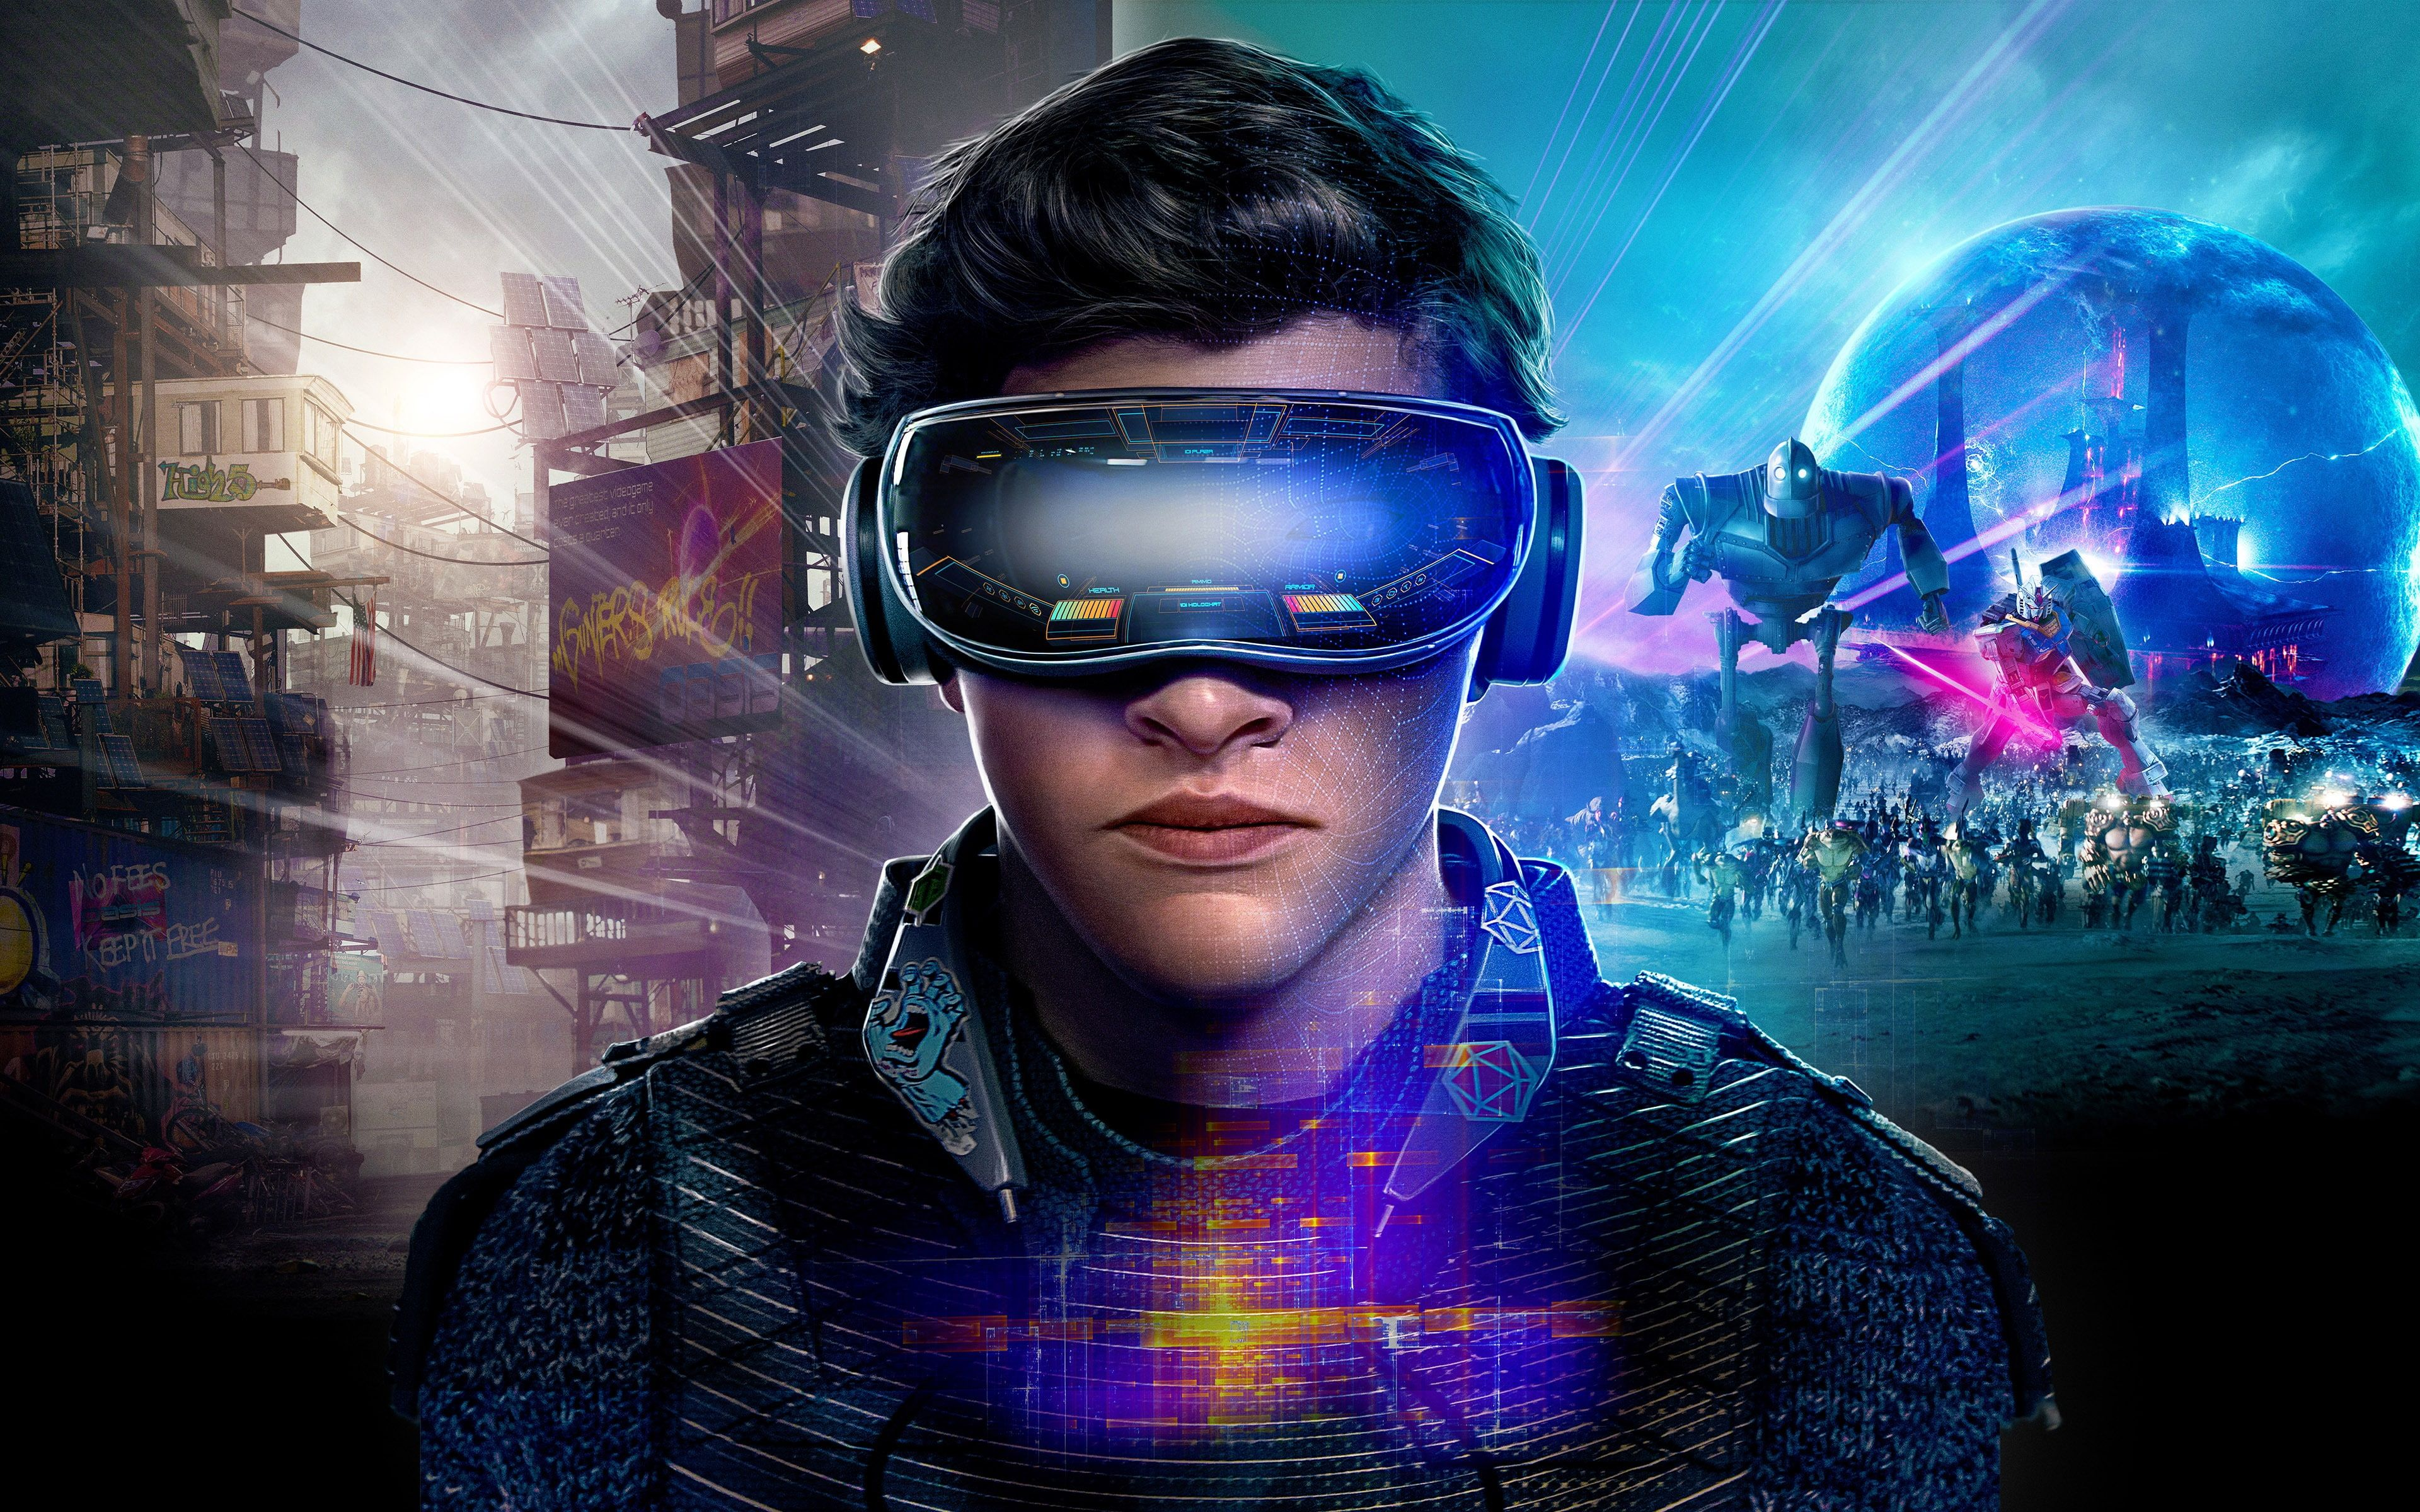 Ready Player One Vr 4k Movie 2018 Ready Player 1 Wallpaper 4k Wallpaper Hdwallpaper Desktop In 2020 Ready Player One Player One Movies To Watch